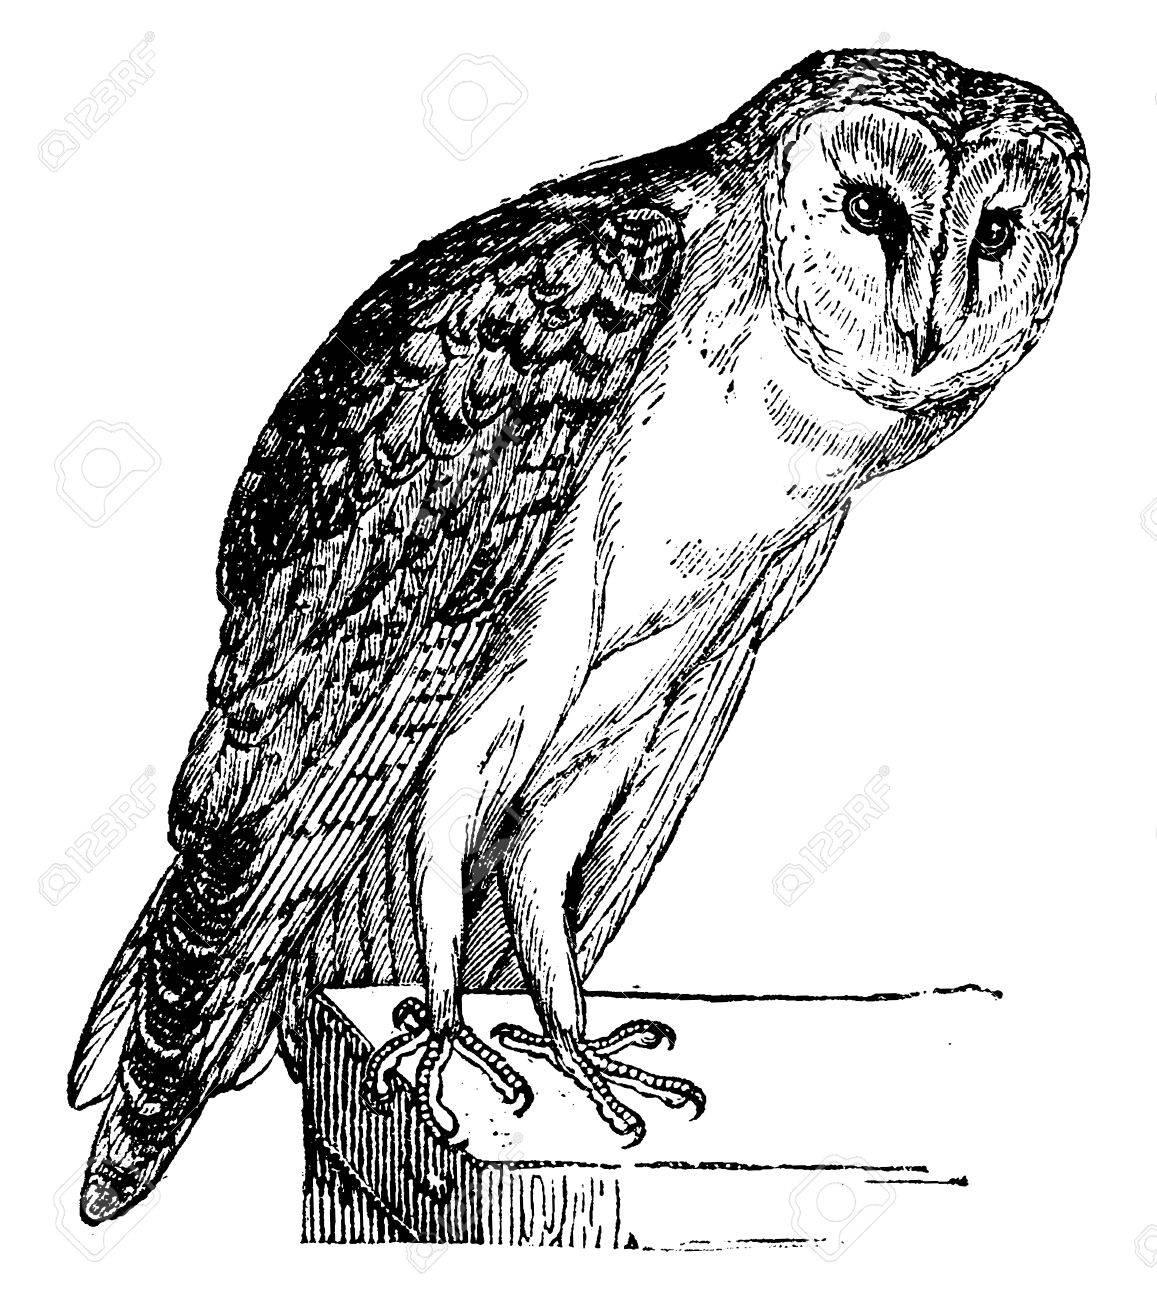 Owl, vintage engraved illustration. Natural History of Animals, 1880. - 41790419